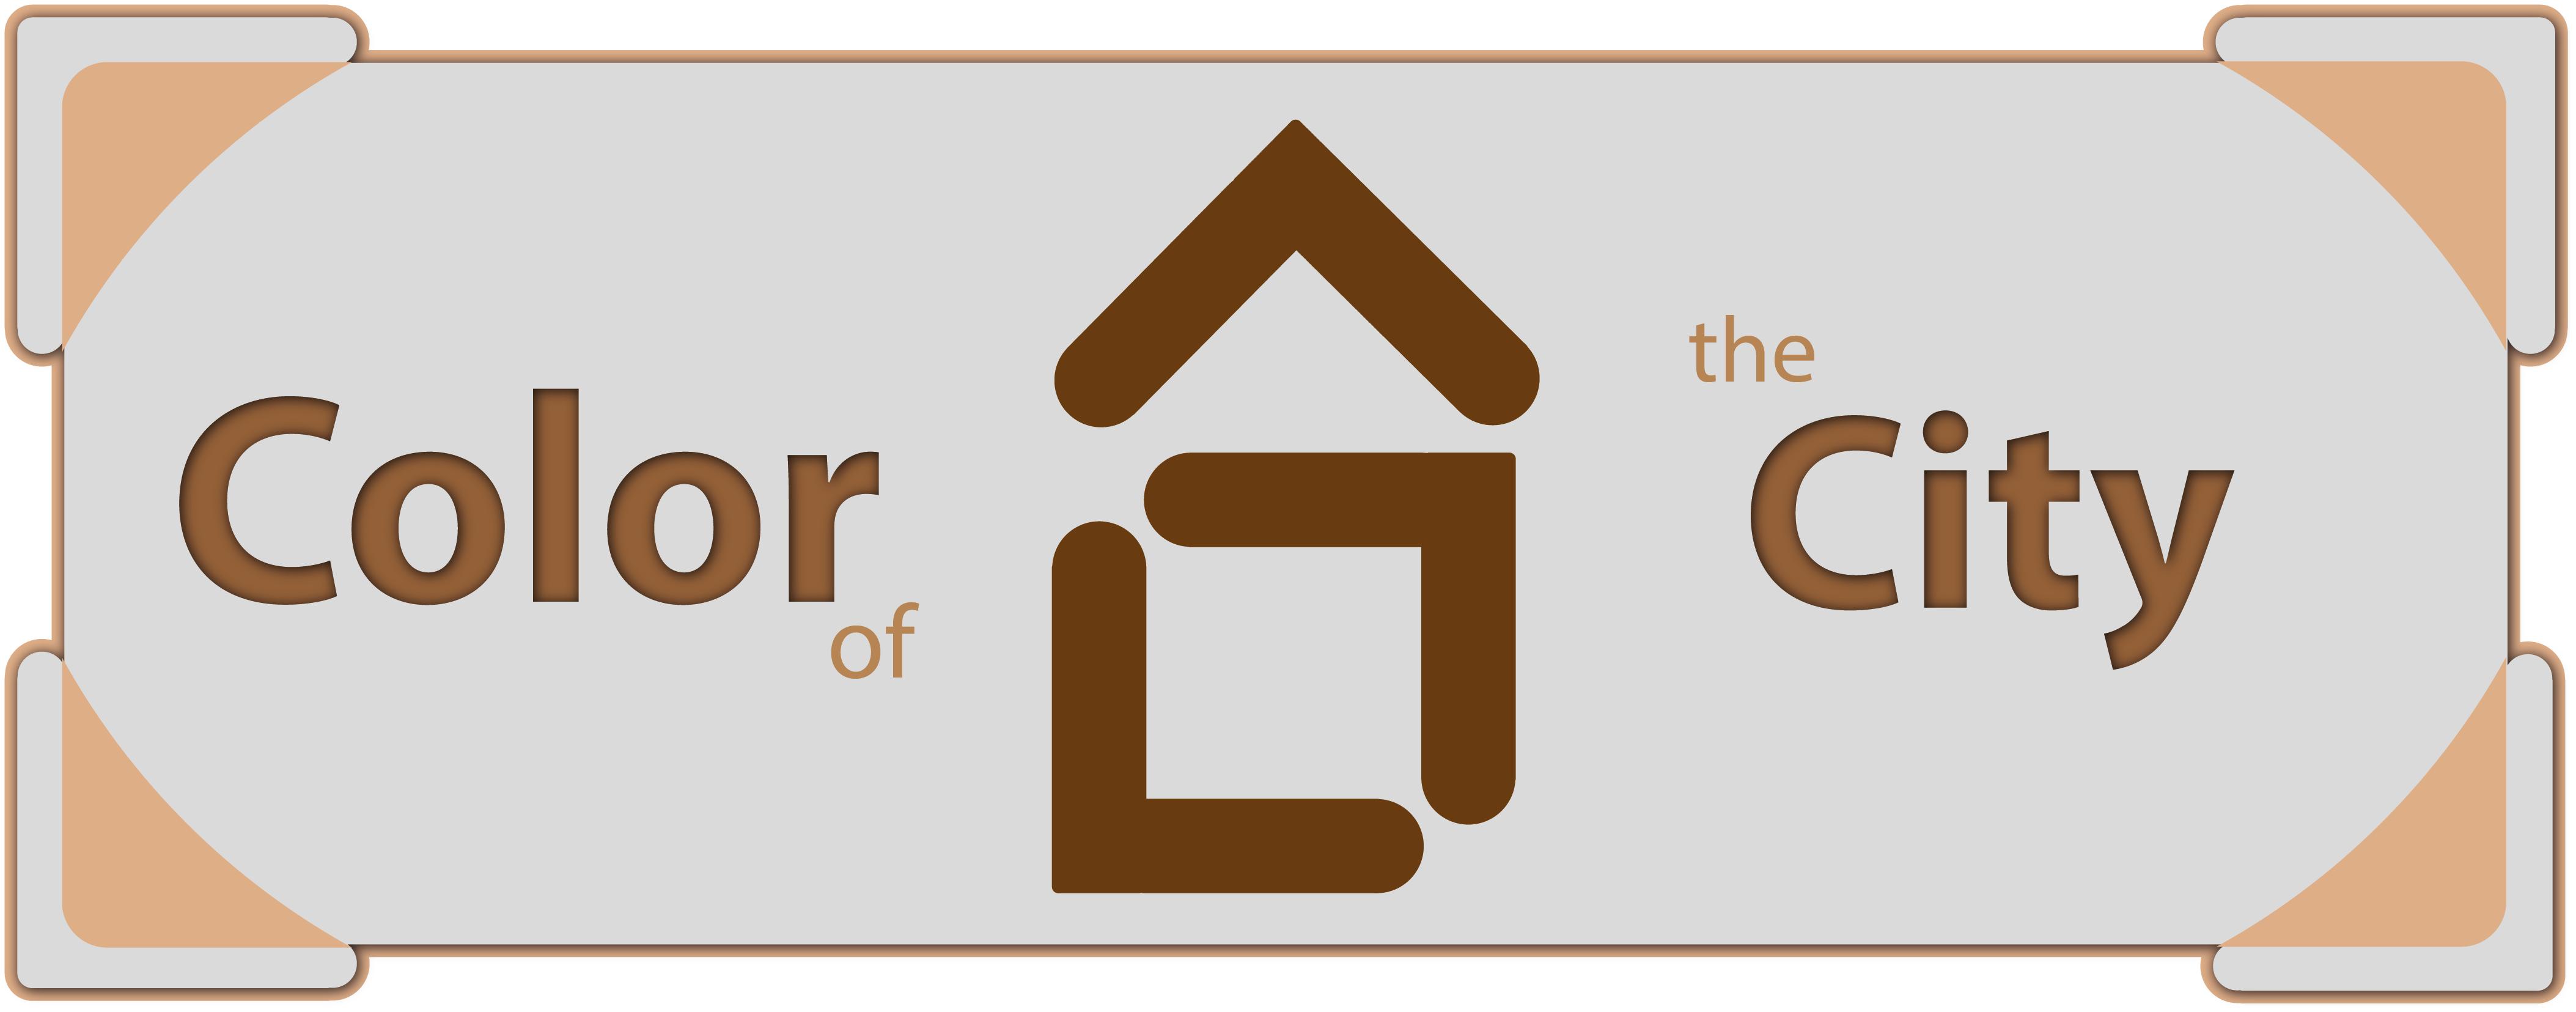 Необходим логотип для сети хостелов фото f_76551a767e9164a7.png